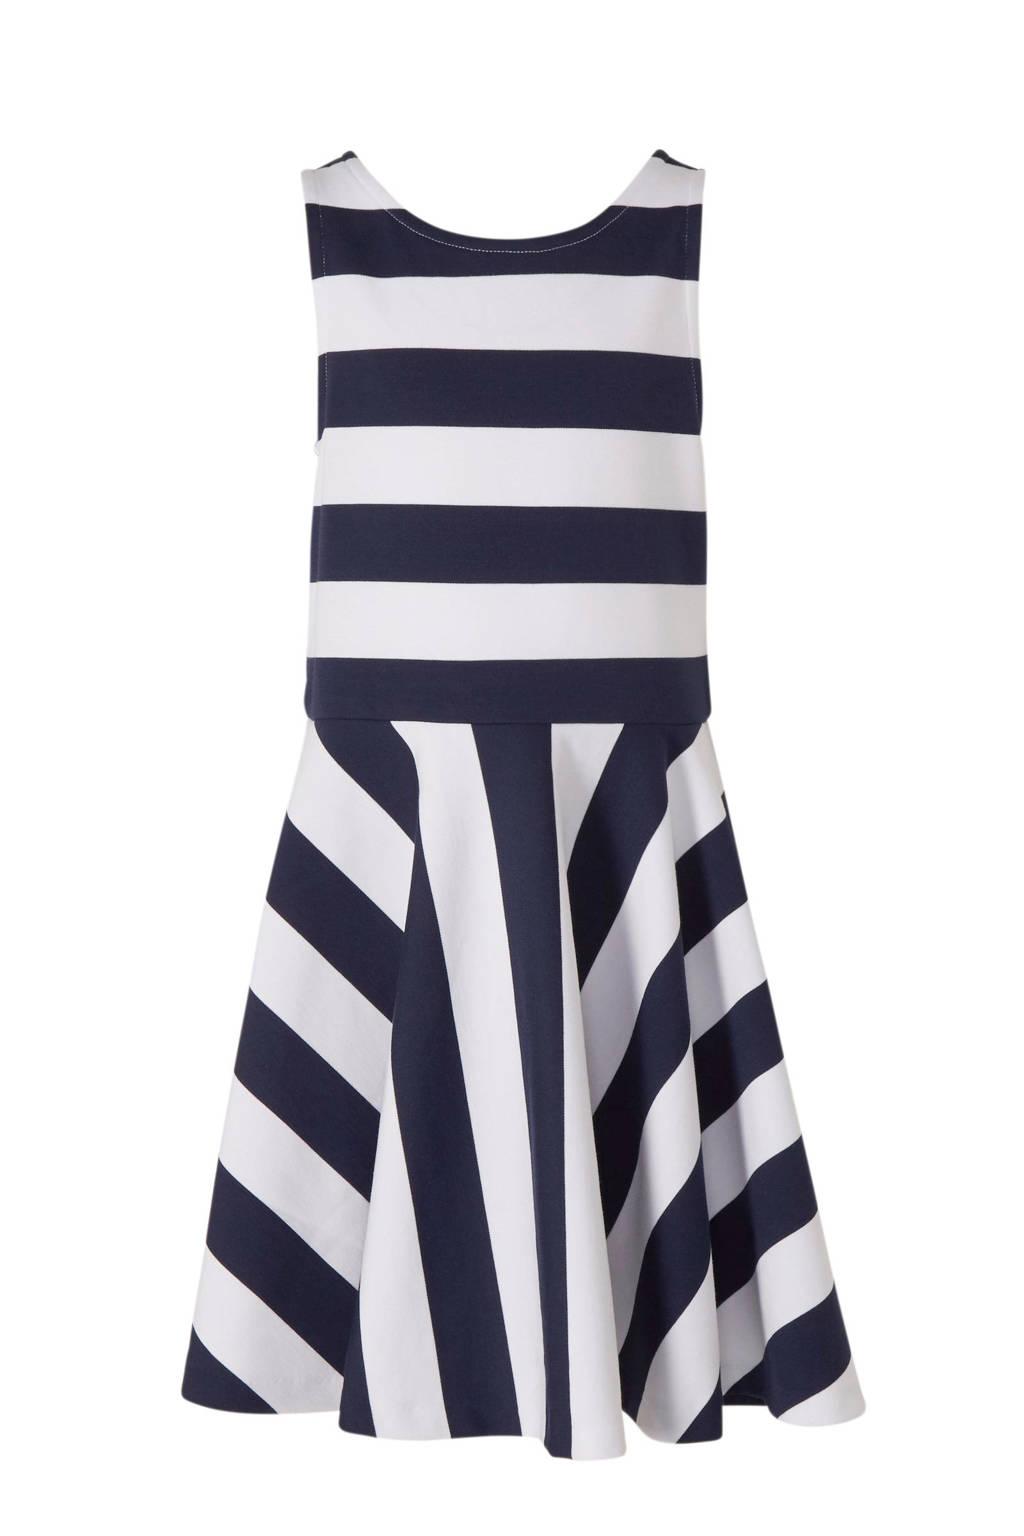 POLO Ralph Lauren gestreepte jurk donkerblauw/wit, Donkerblauw/wit